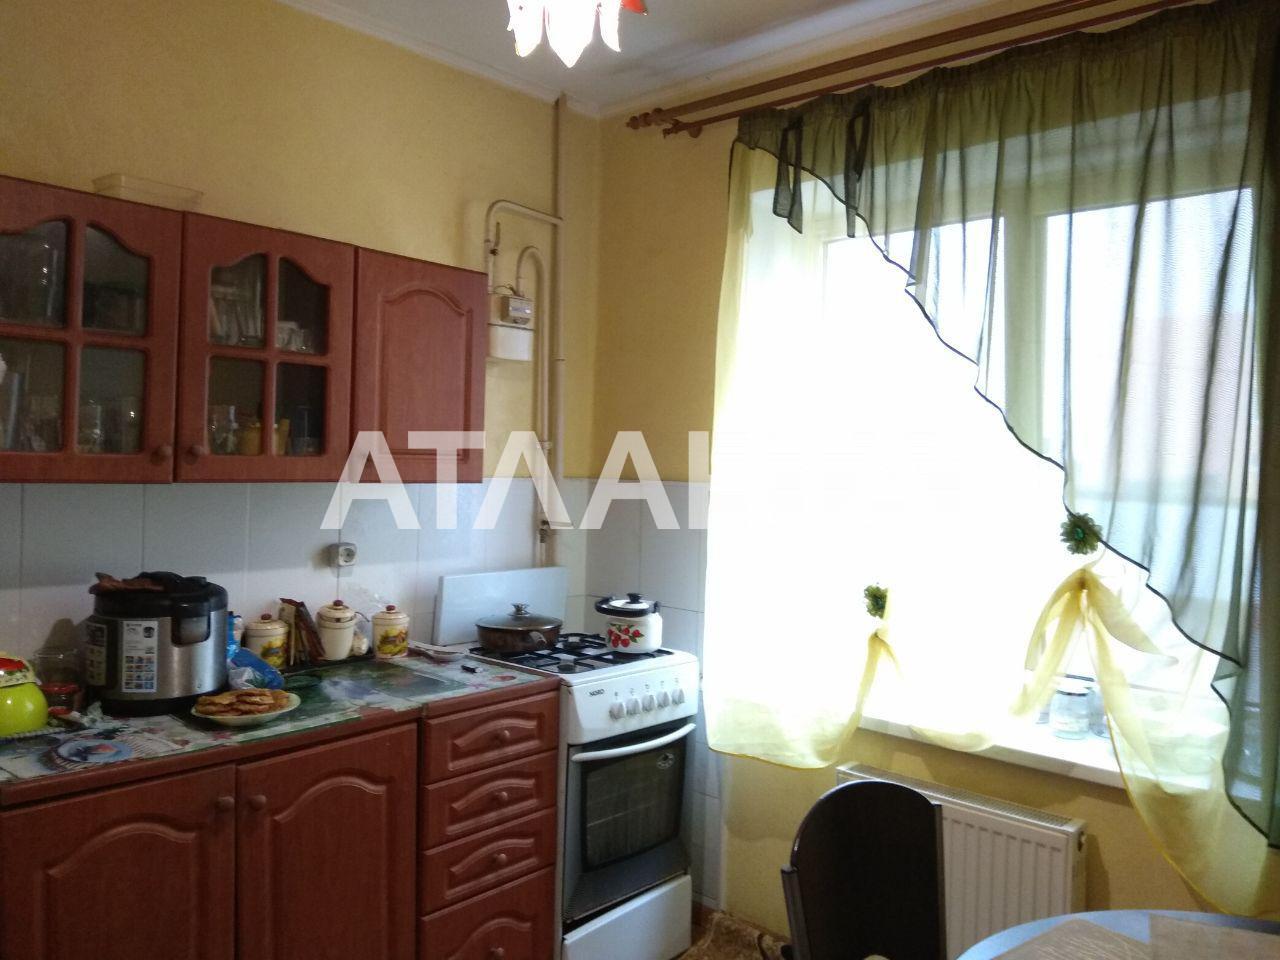 Продается 1-комнатная Квартира на ул. Радужный М-Н — 32 000 у.е. (фото №6)